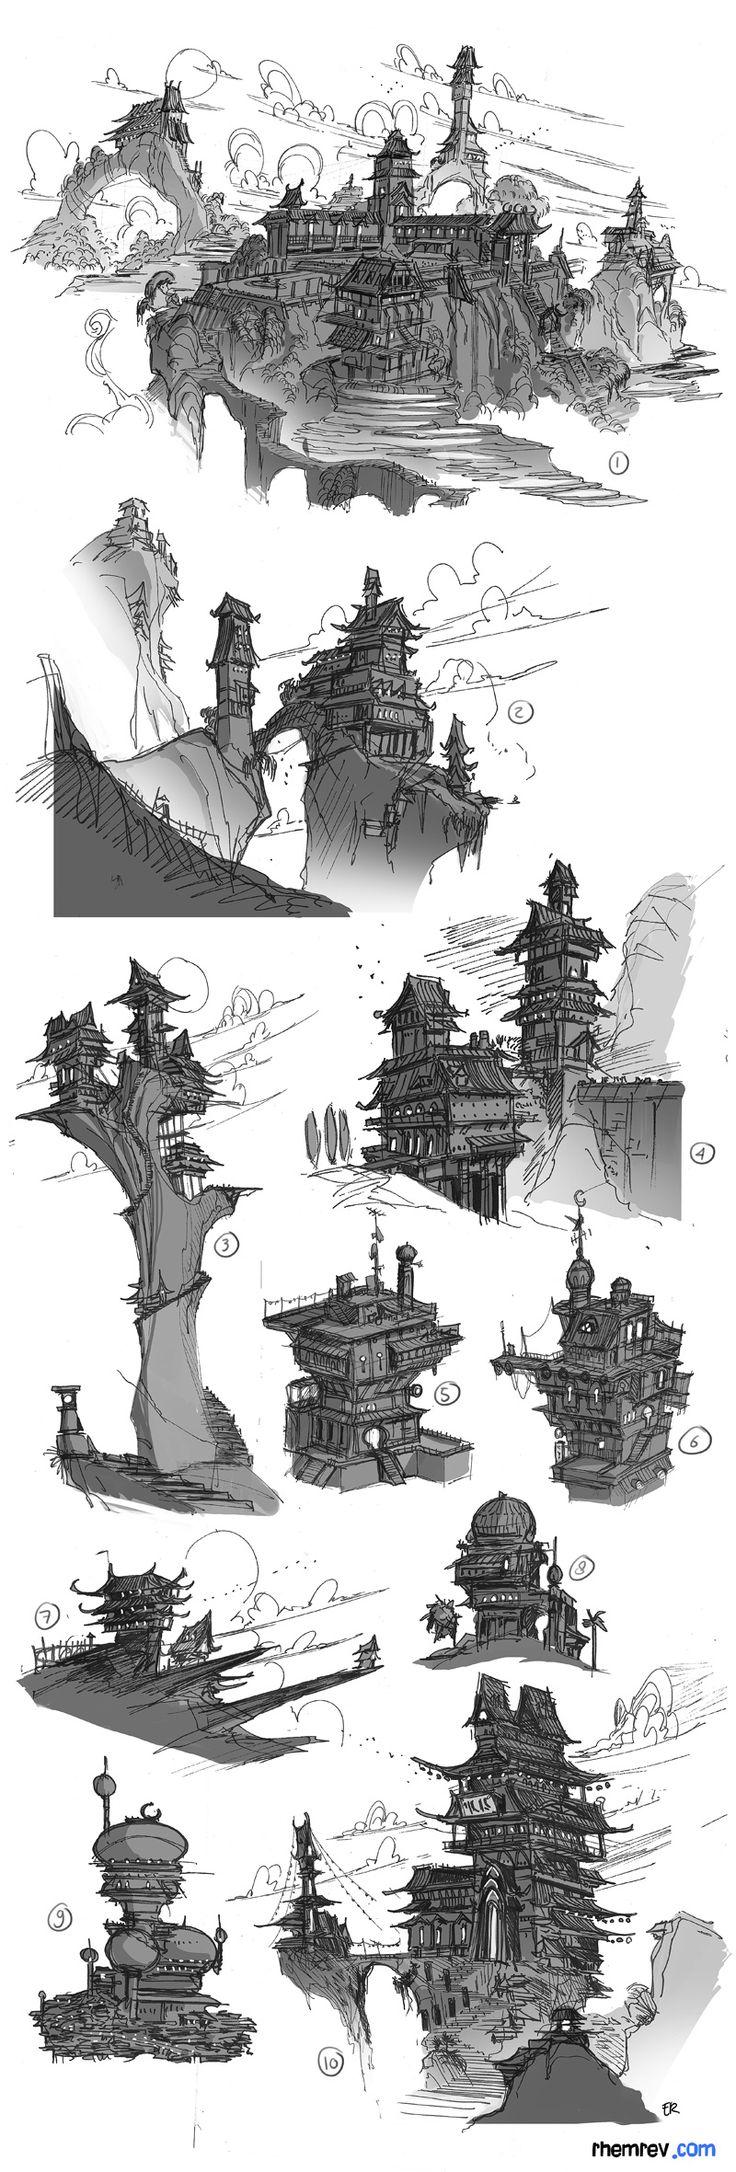 http://rhemdoodles.blogspot.com/2011/04/cliff-dwellings-thumbnails.html  #wallartroad #conceptart